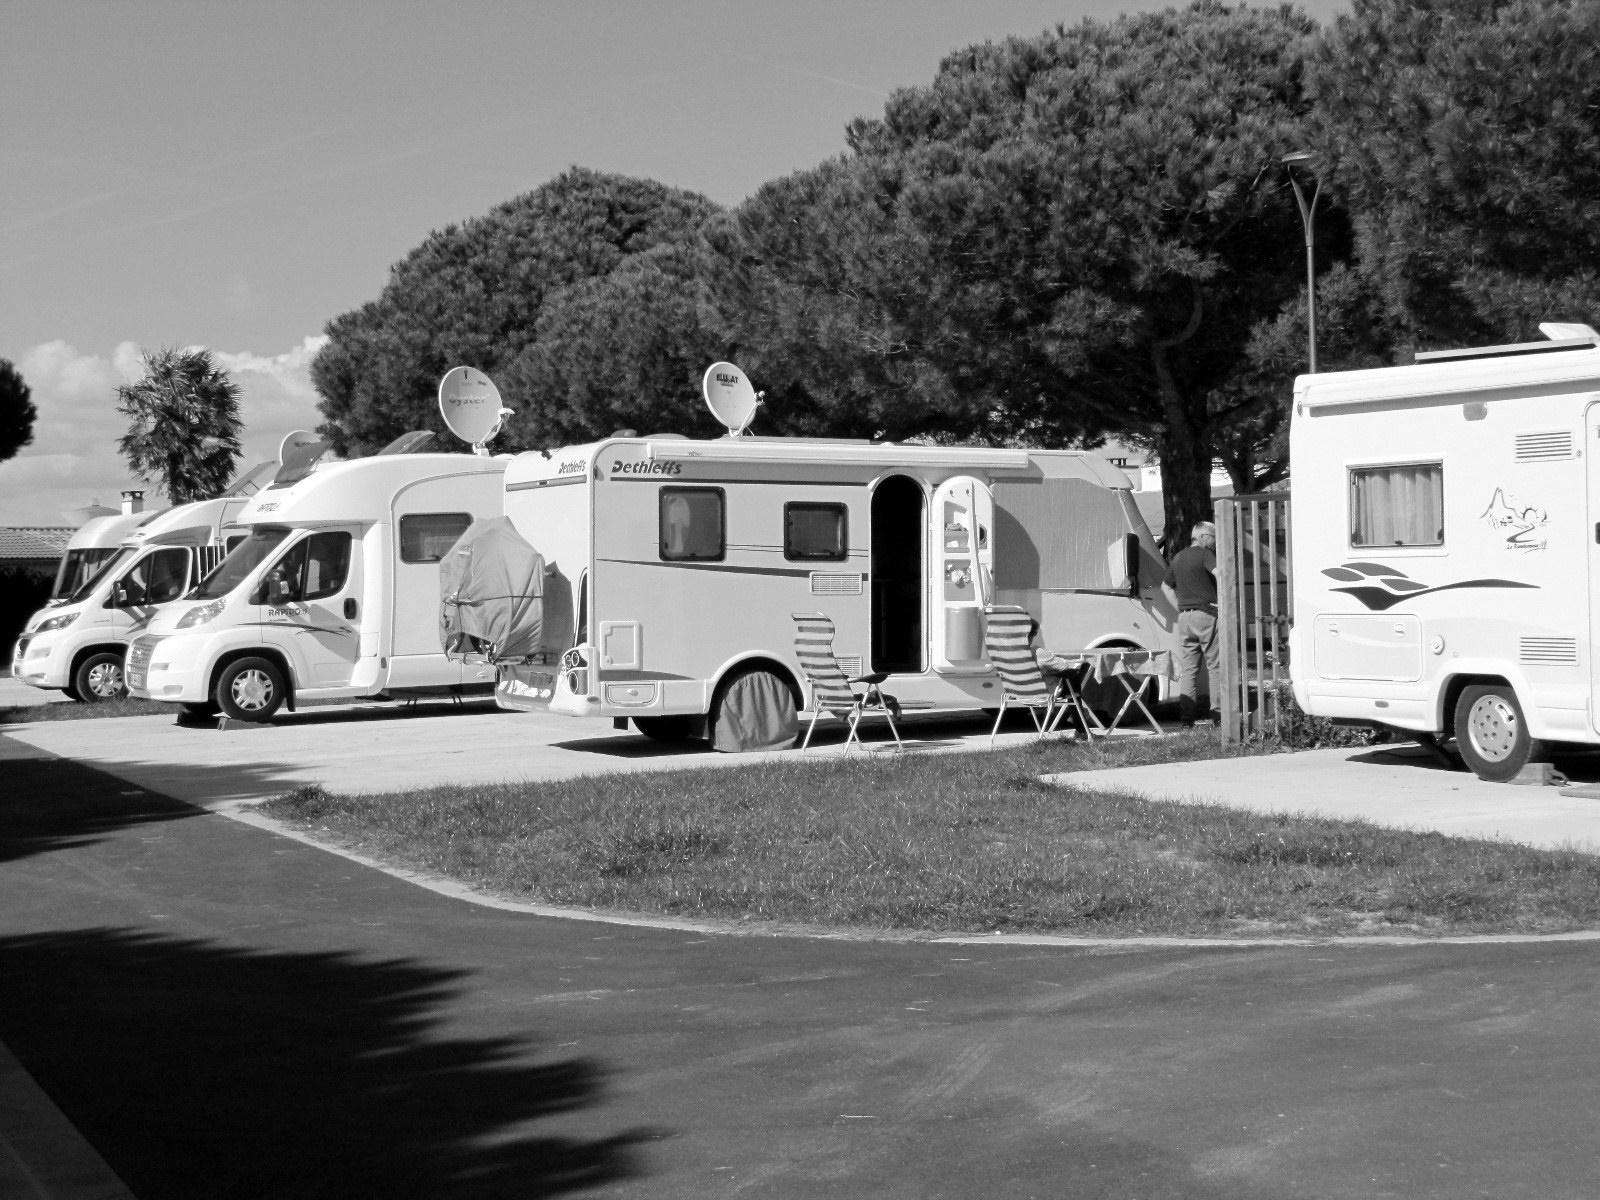 allianz france assure la location de camping cars l 39 assurance en mouvement. Black Bedroom Furniture Sets. Home Design Ideas